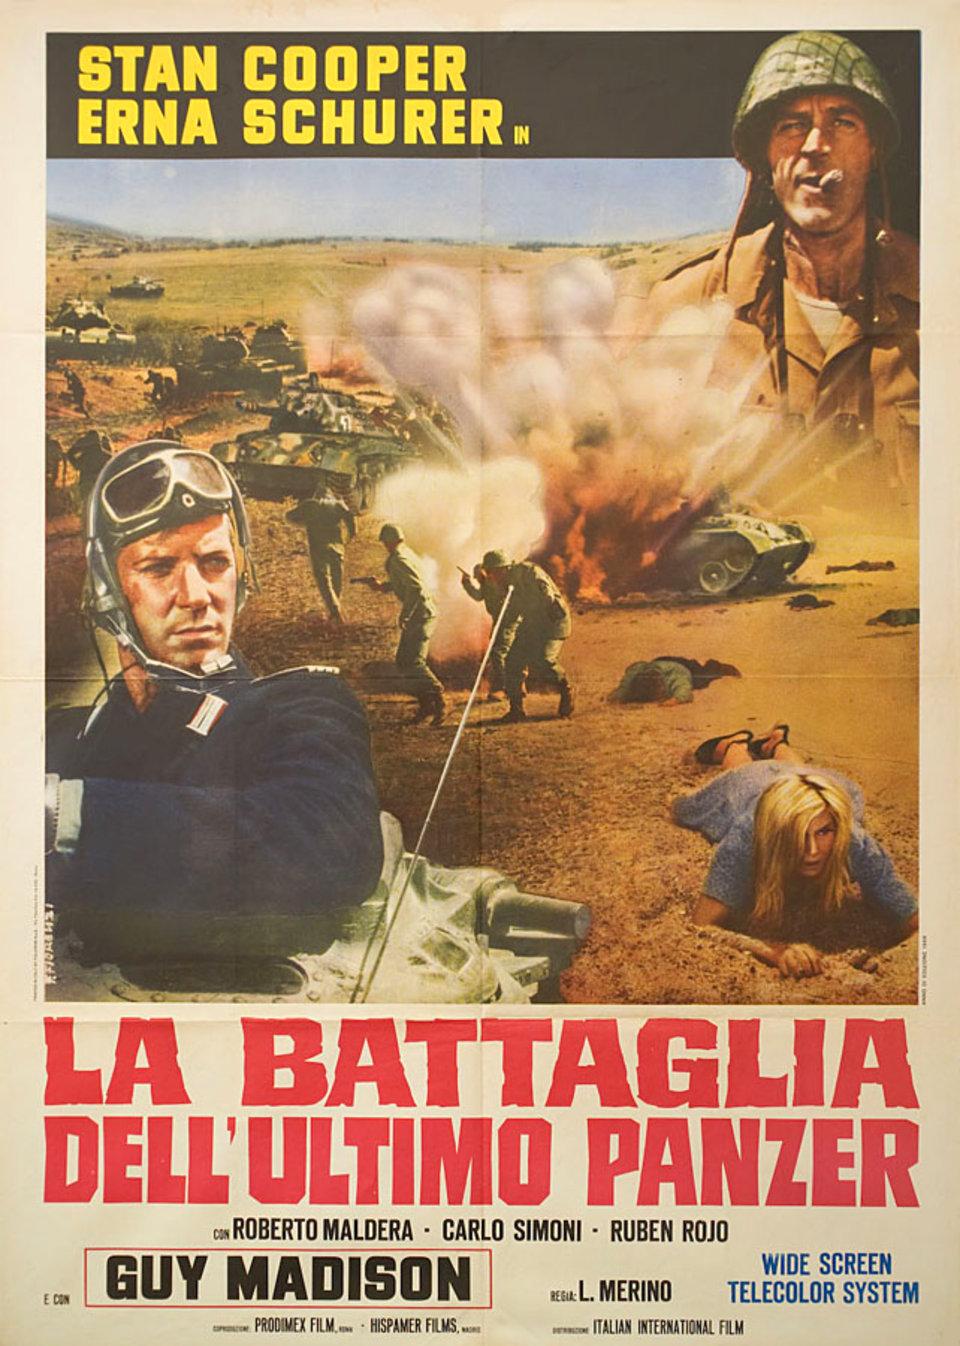 The Battle of the Last Panzer 1969 Italian Due Fogli Poster